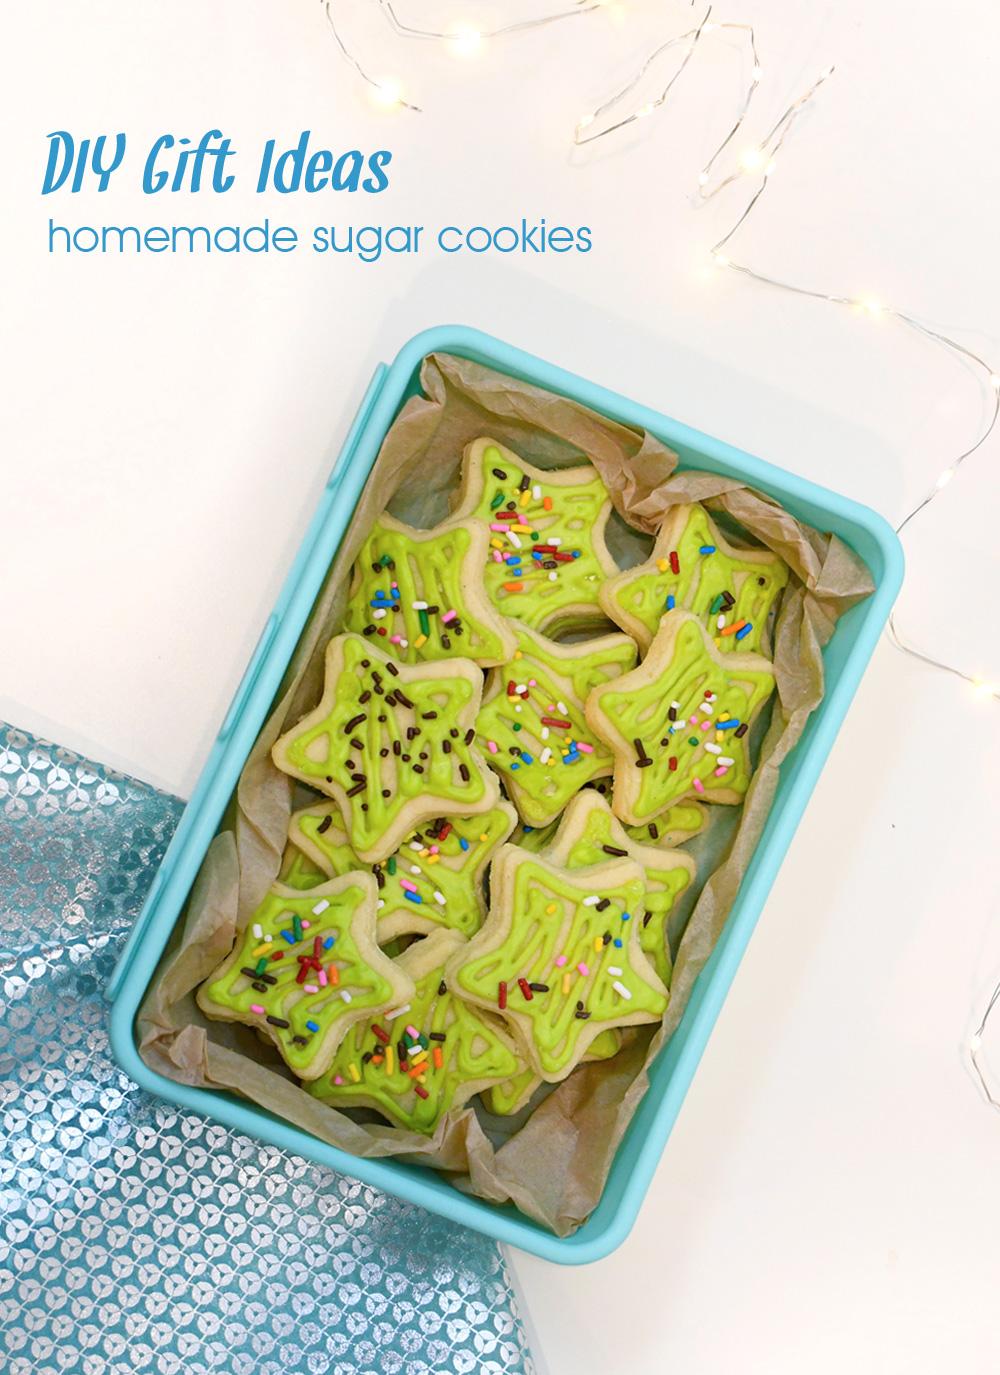 DIY Gift ideas homemade star sugar cookies